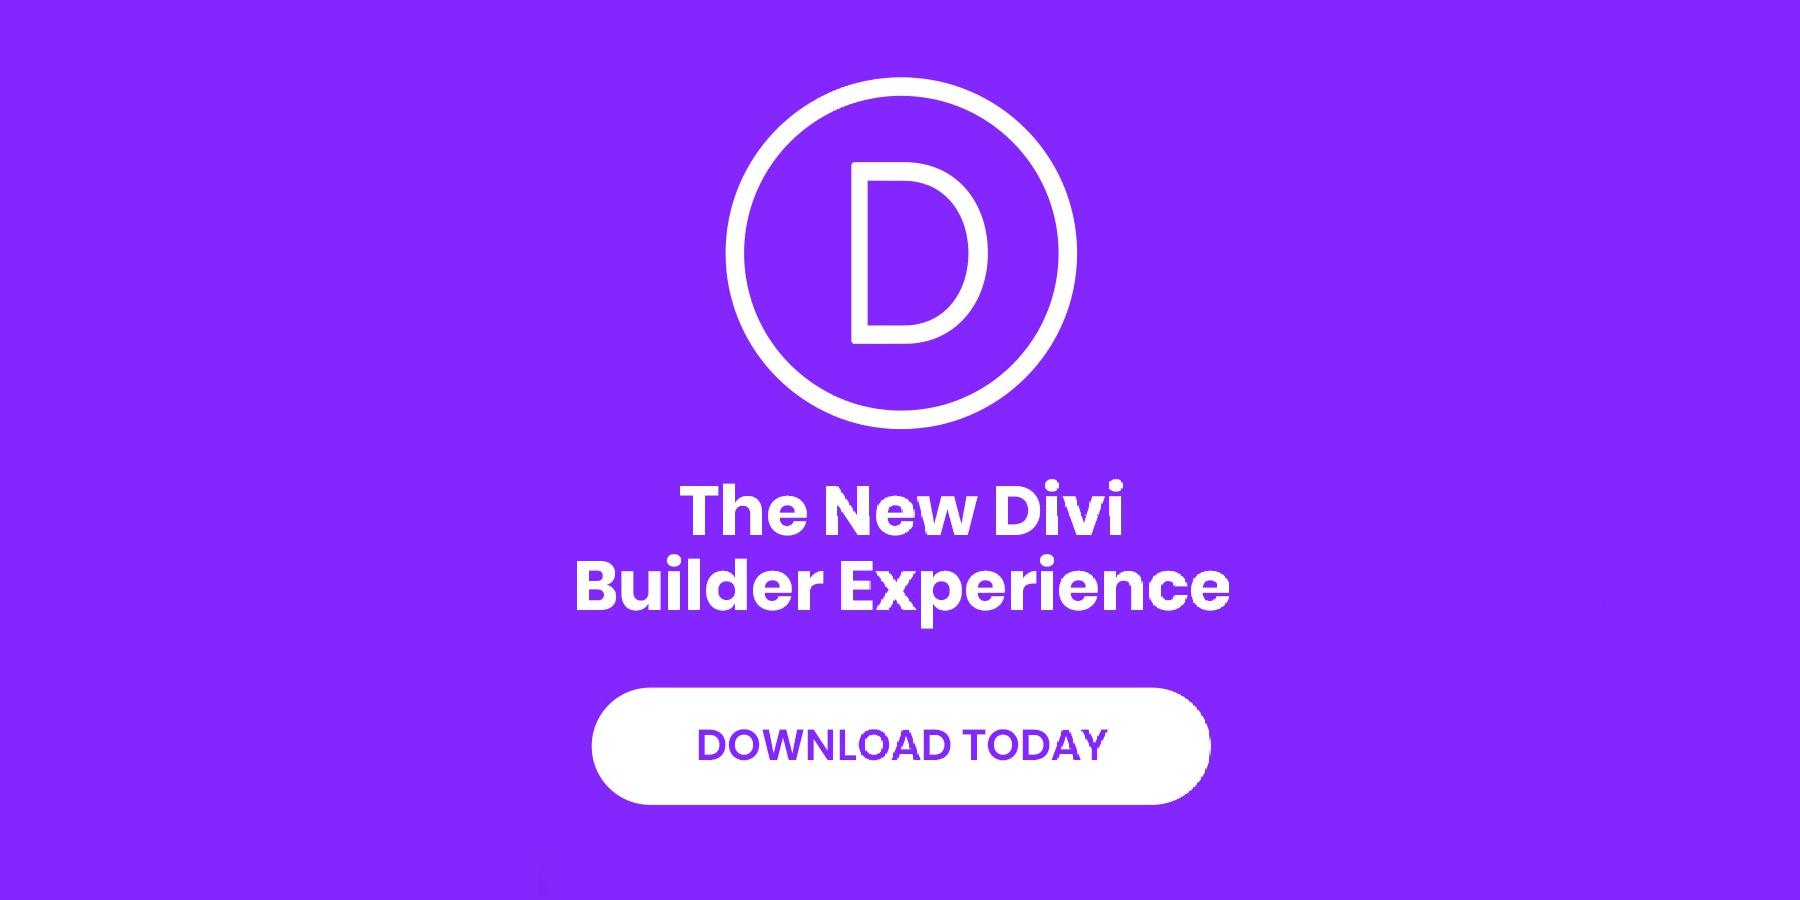 Divi Builder Experience